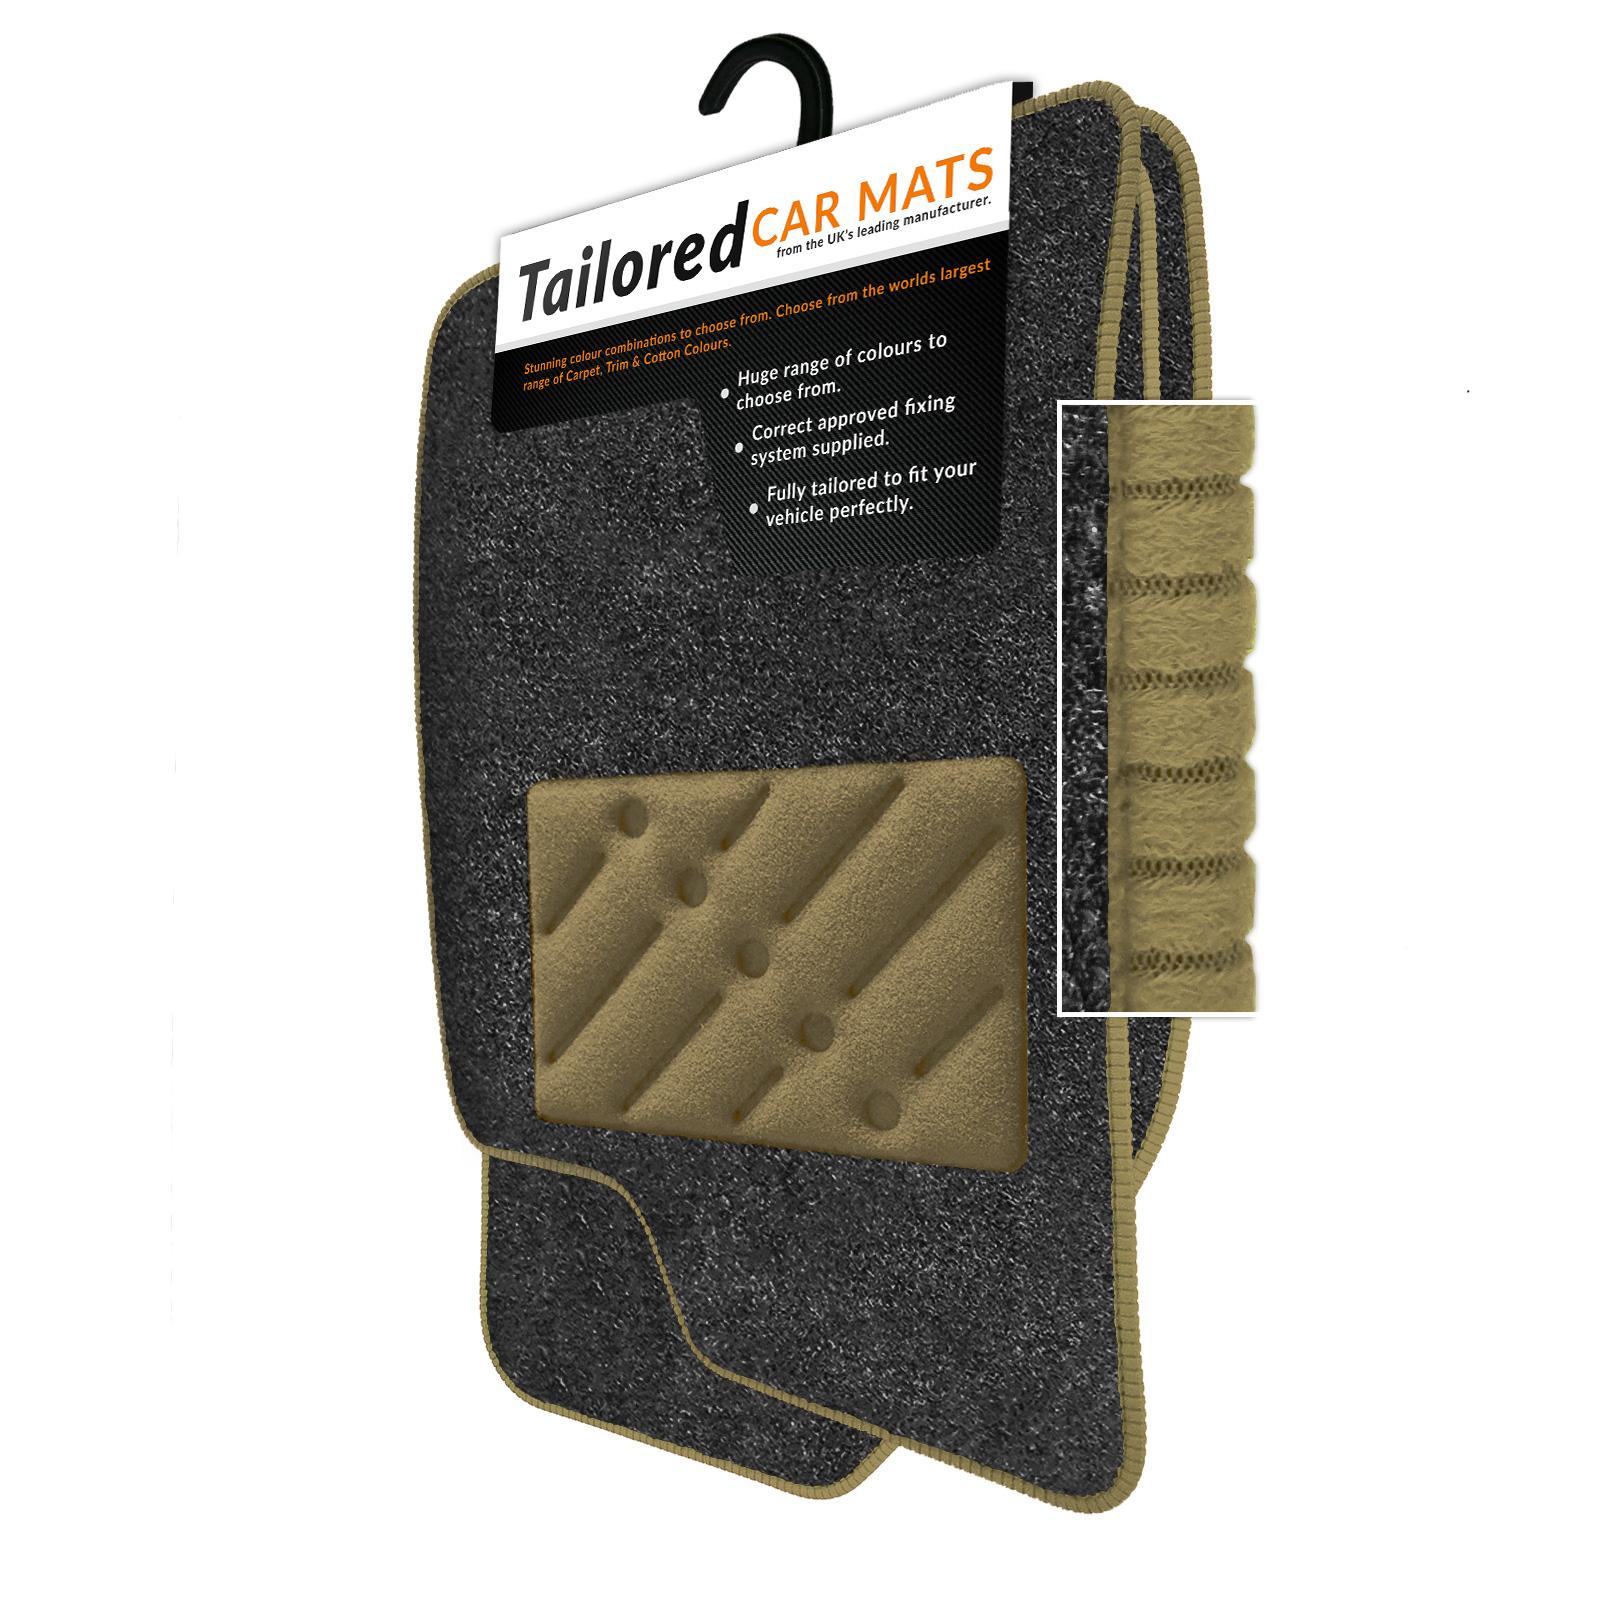 Seat-Tarraco-Car-Mats-2019-Tailored-amp-Heel-Pad-A thumbnail 15